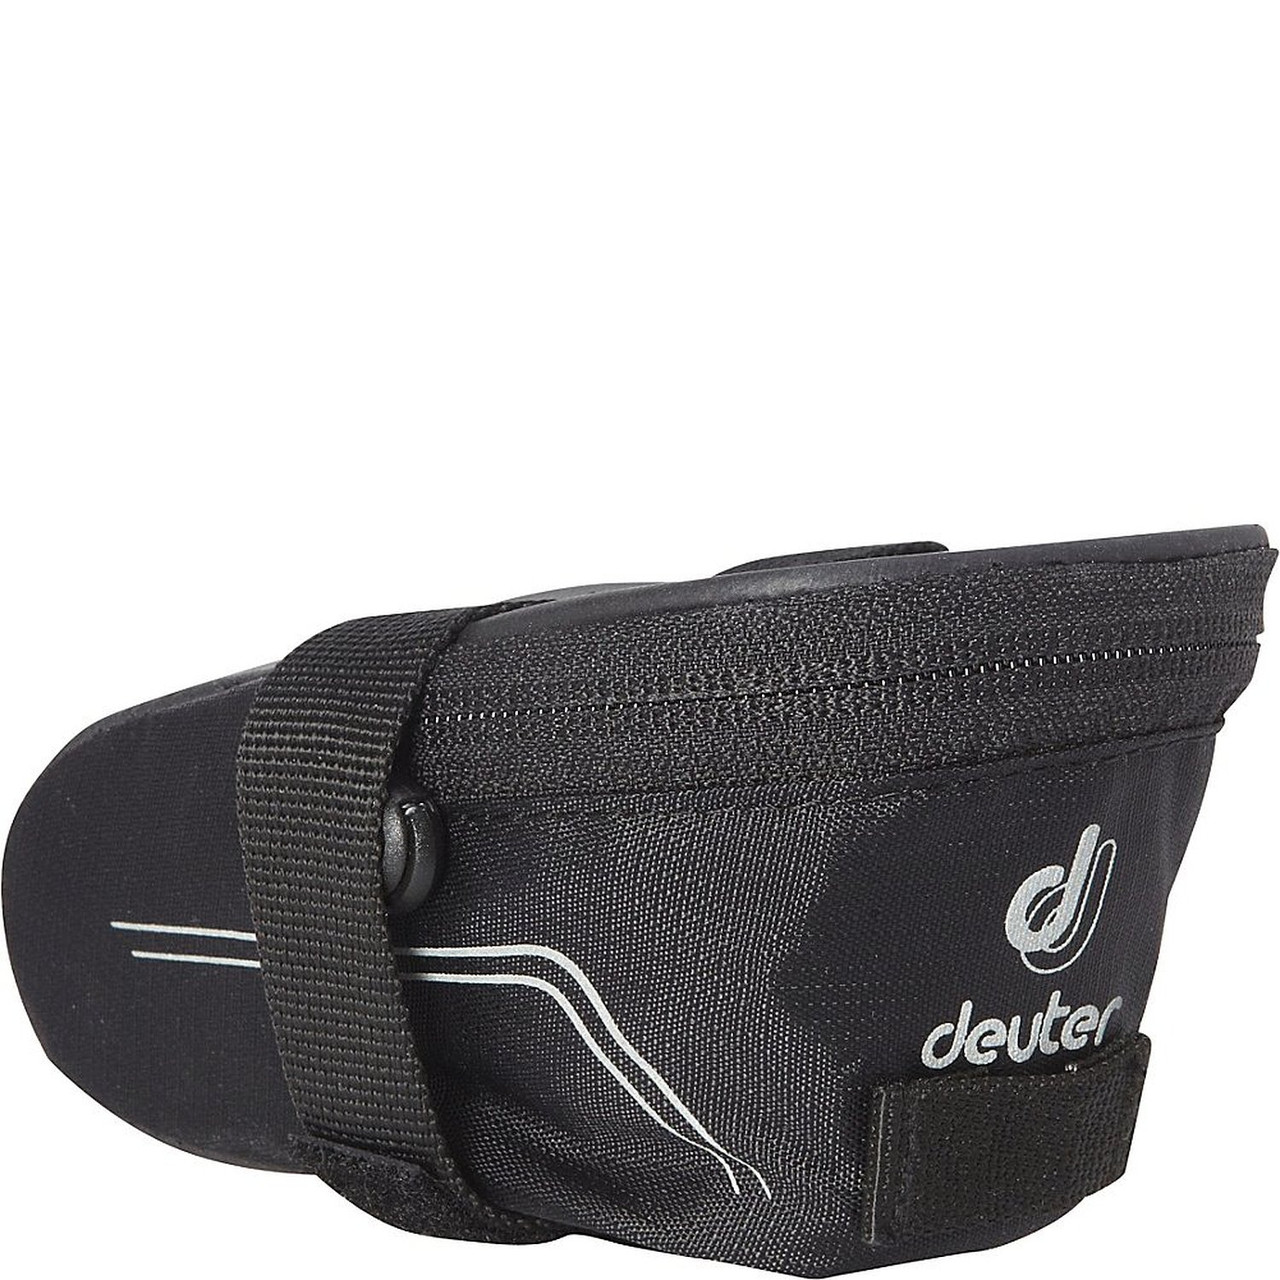 84cffef685b1 Подседельная сумка Deuter Bike Bag XS black (32652 7000) - Атлантида -  интернет-